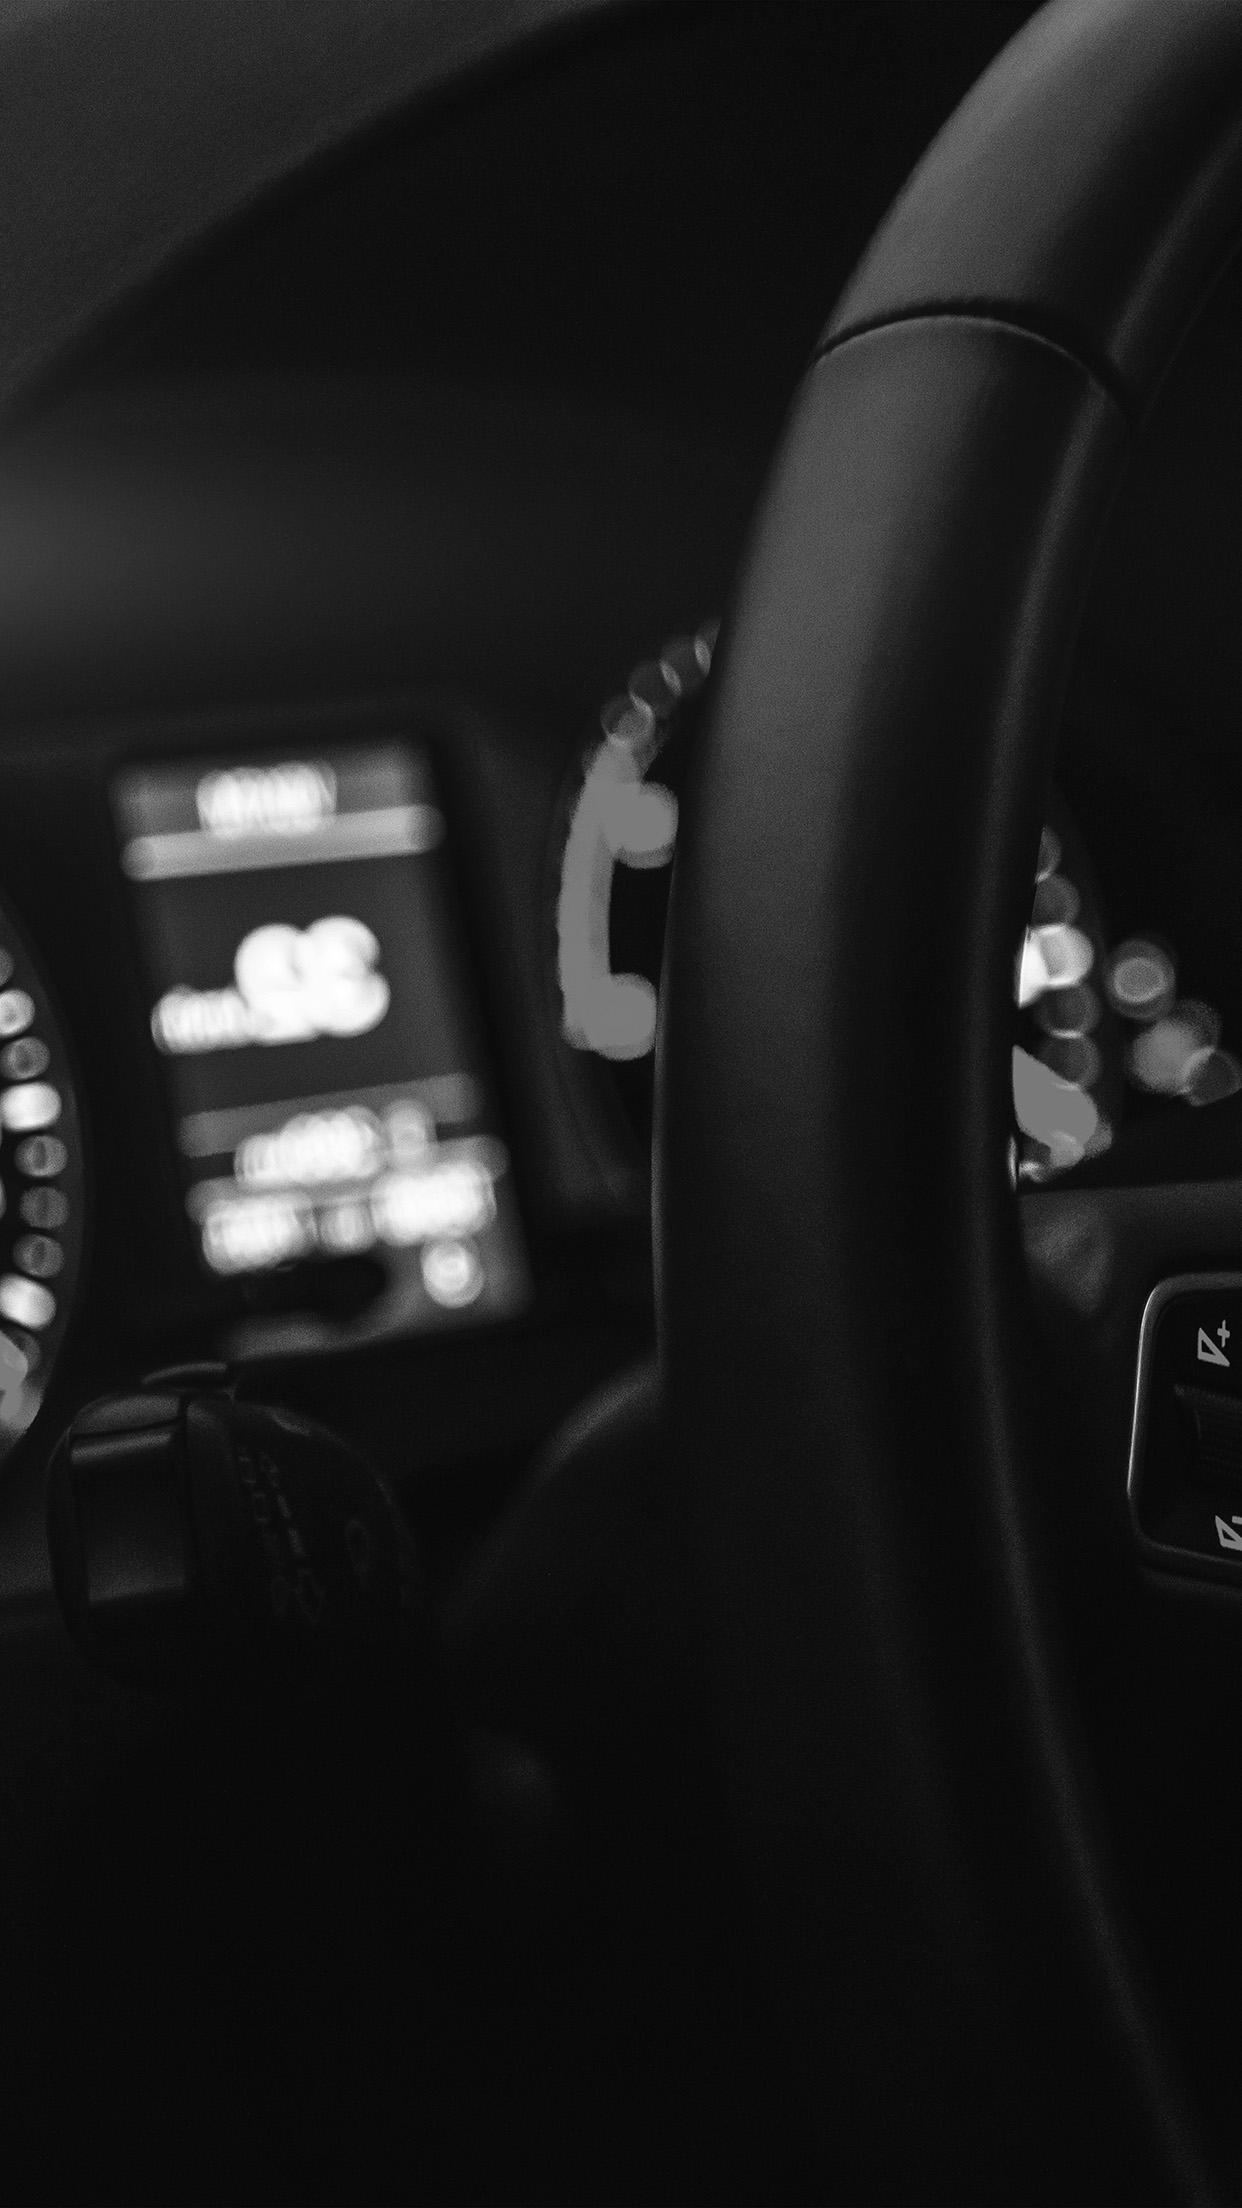 Car Audi Drive Interior Motor Man Dark Bw Night Android Wallpaper